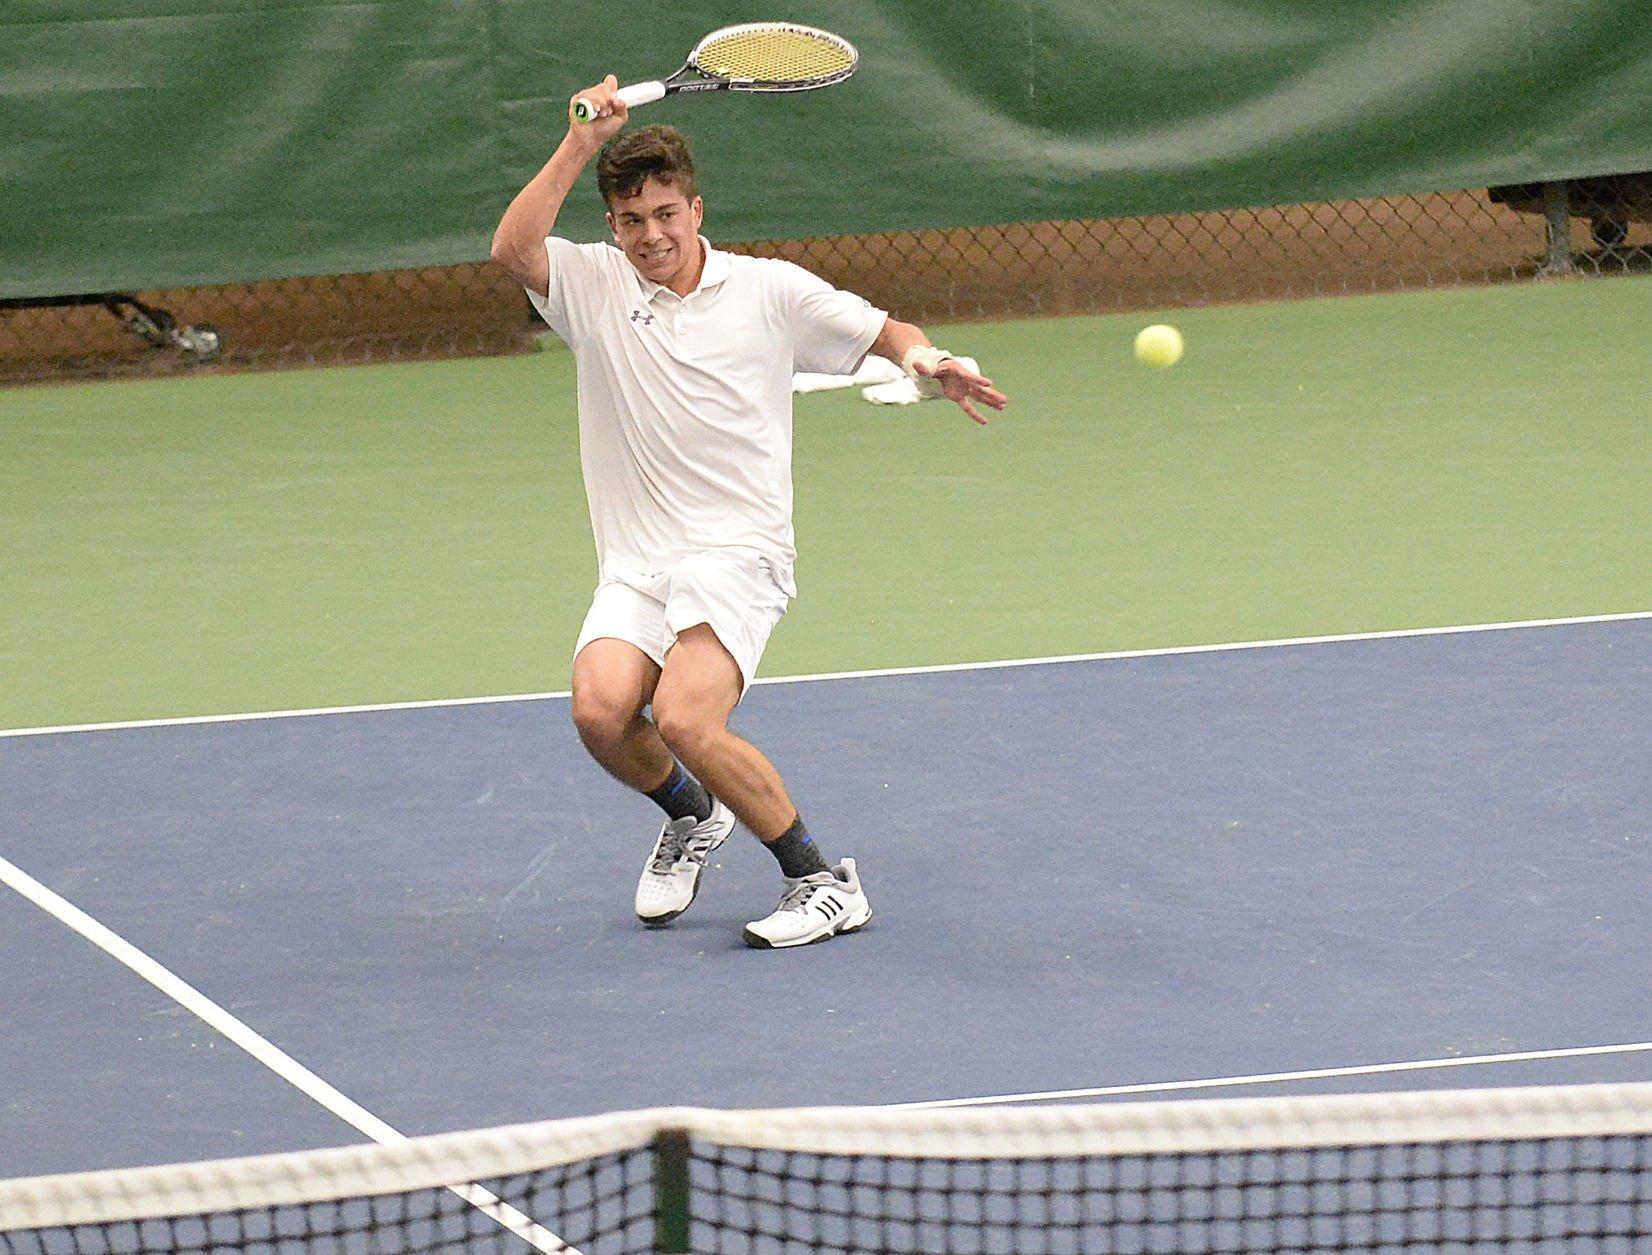 WIAA boys tennis photo: Monona Grove's Cole Lindwall